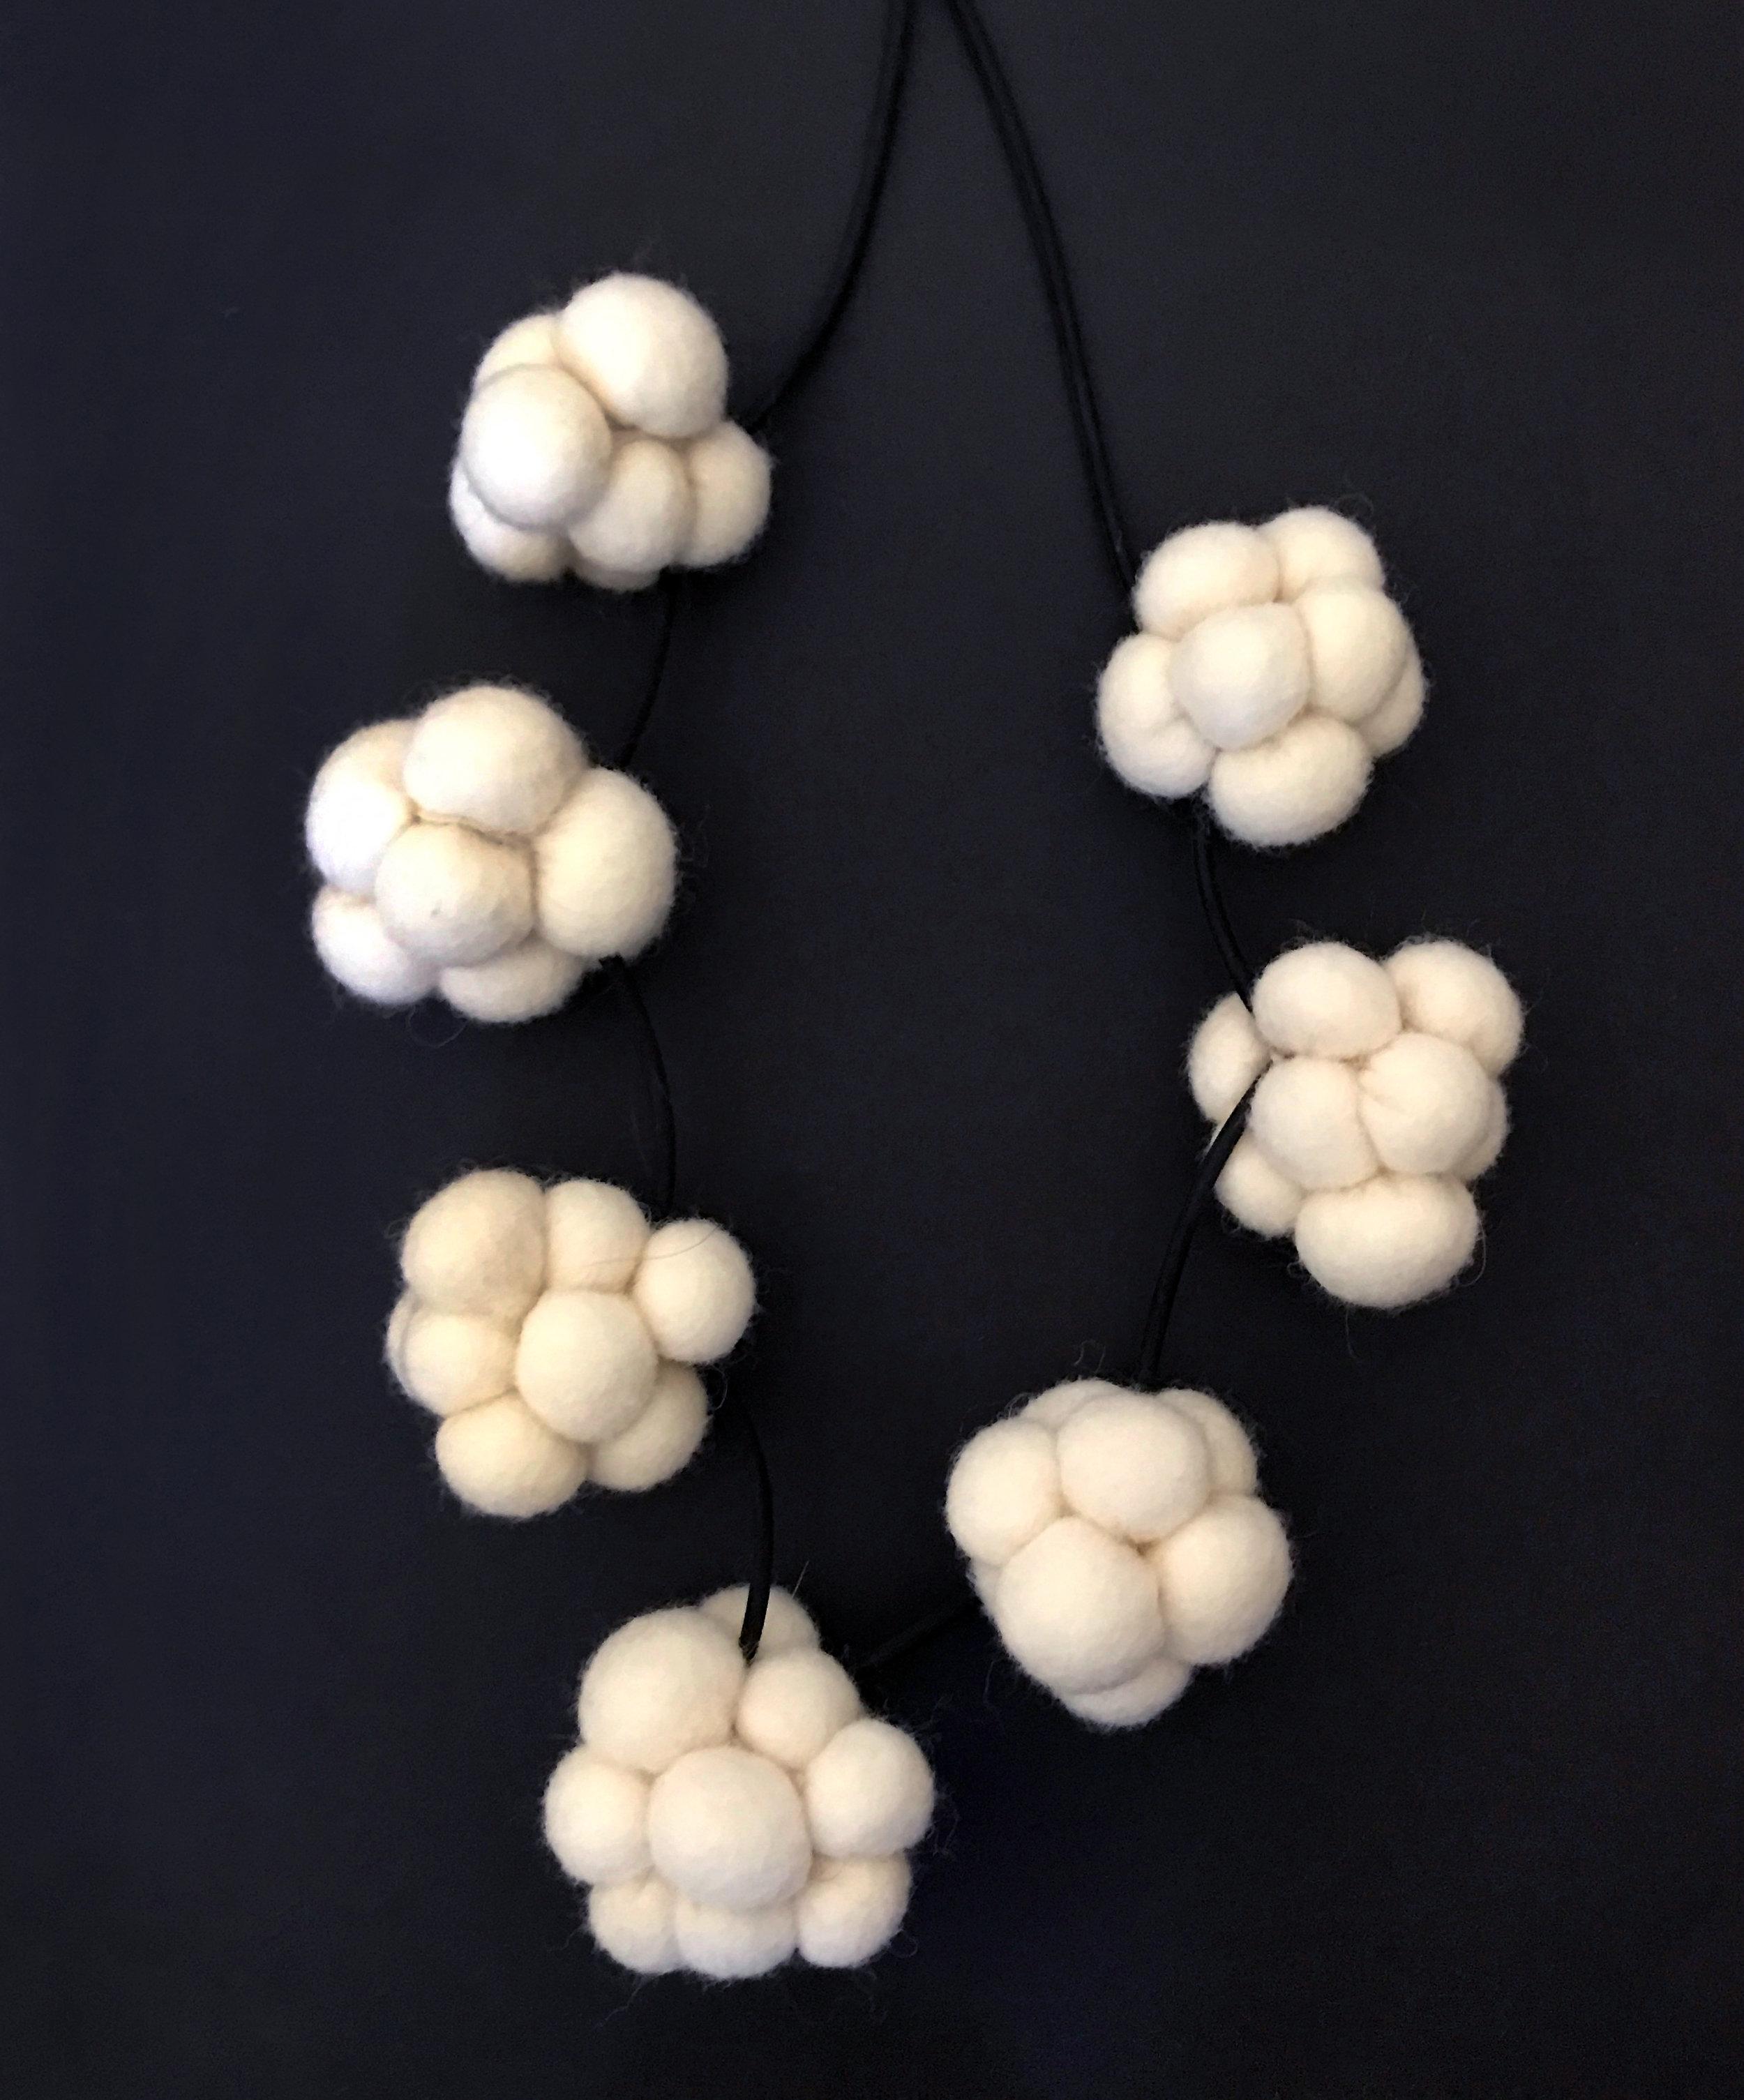 Susannah-Mira_felt-ball-necklace.jpg